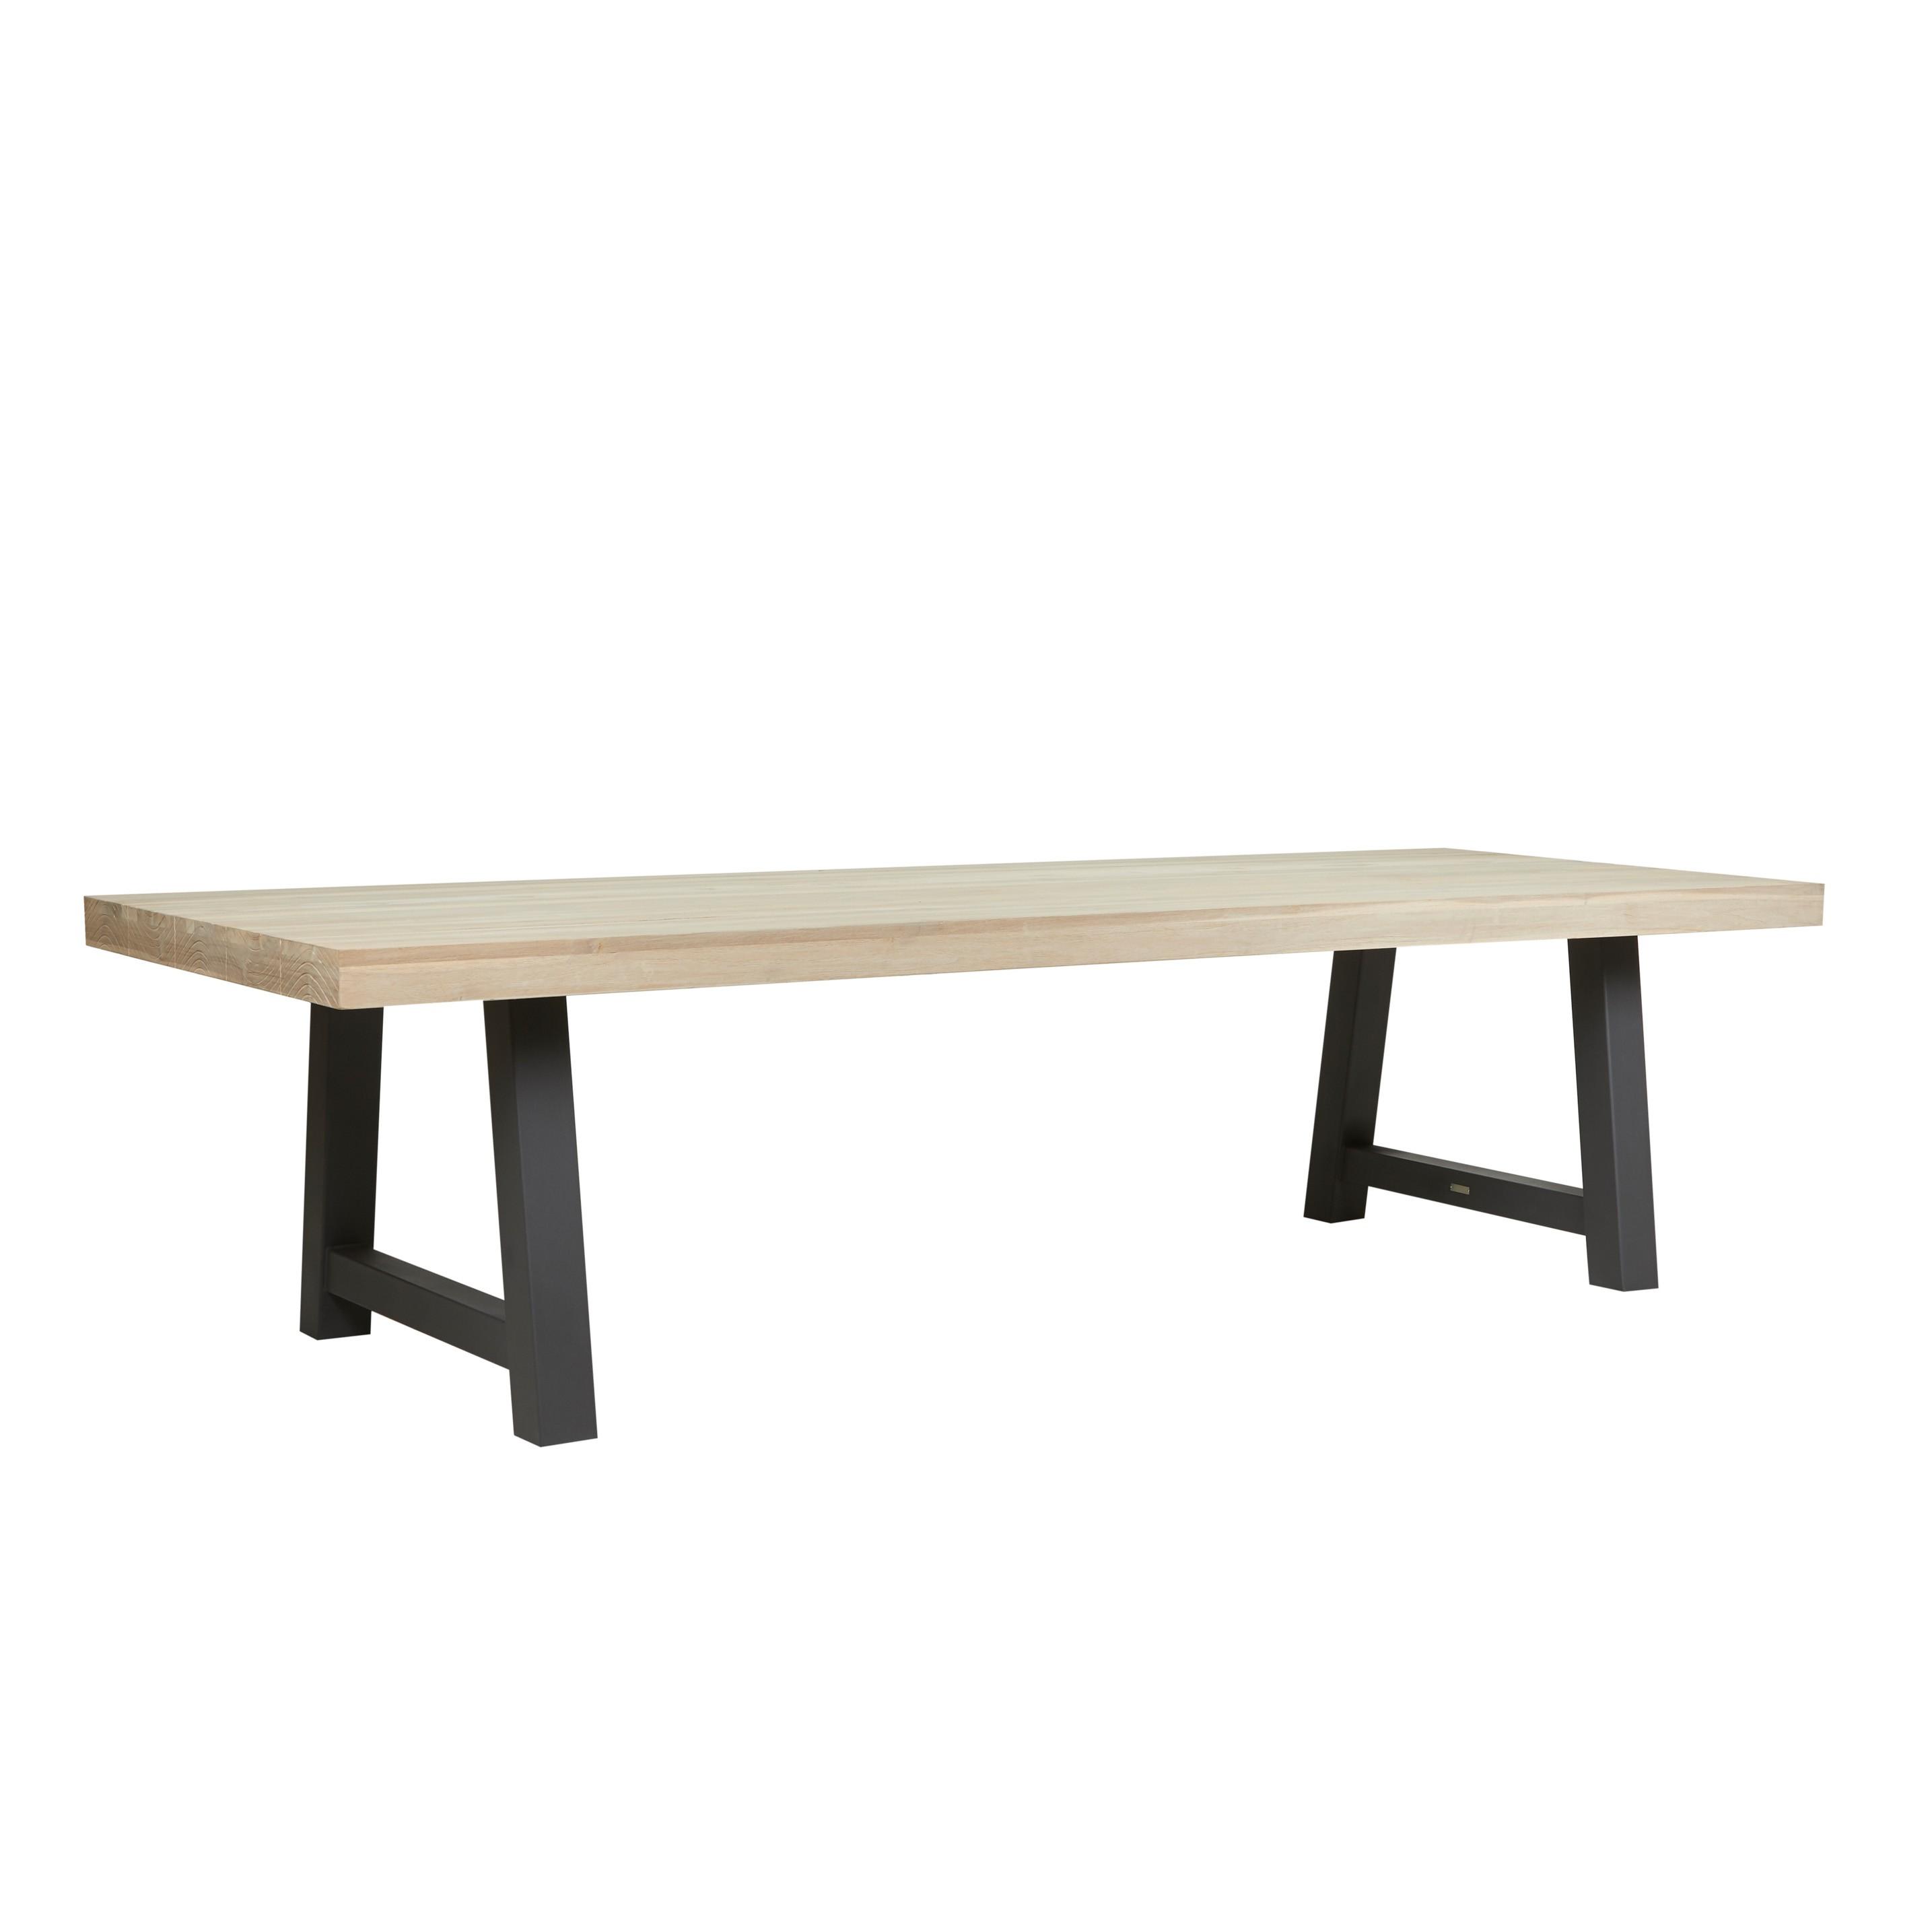 Furniture Hero-Images Dining-Tables granada-beach-ten-seater-02